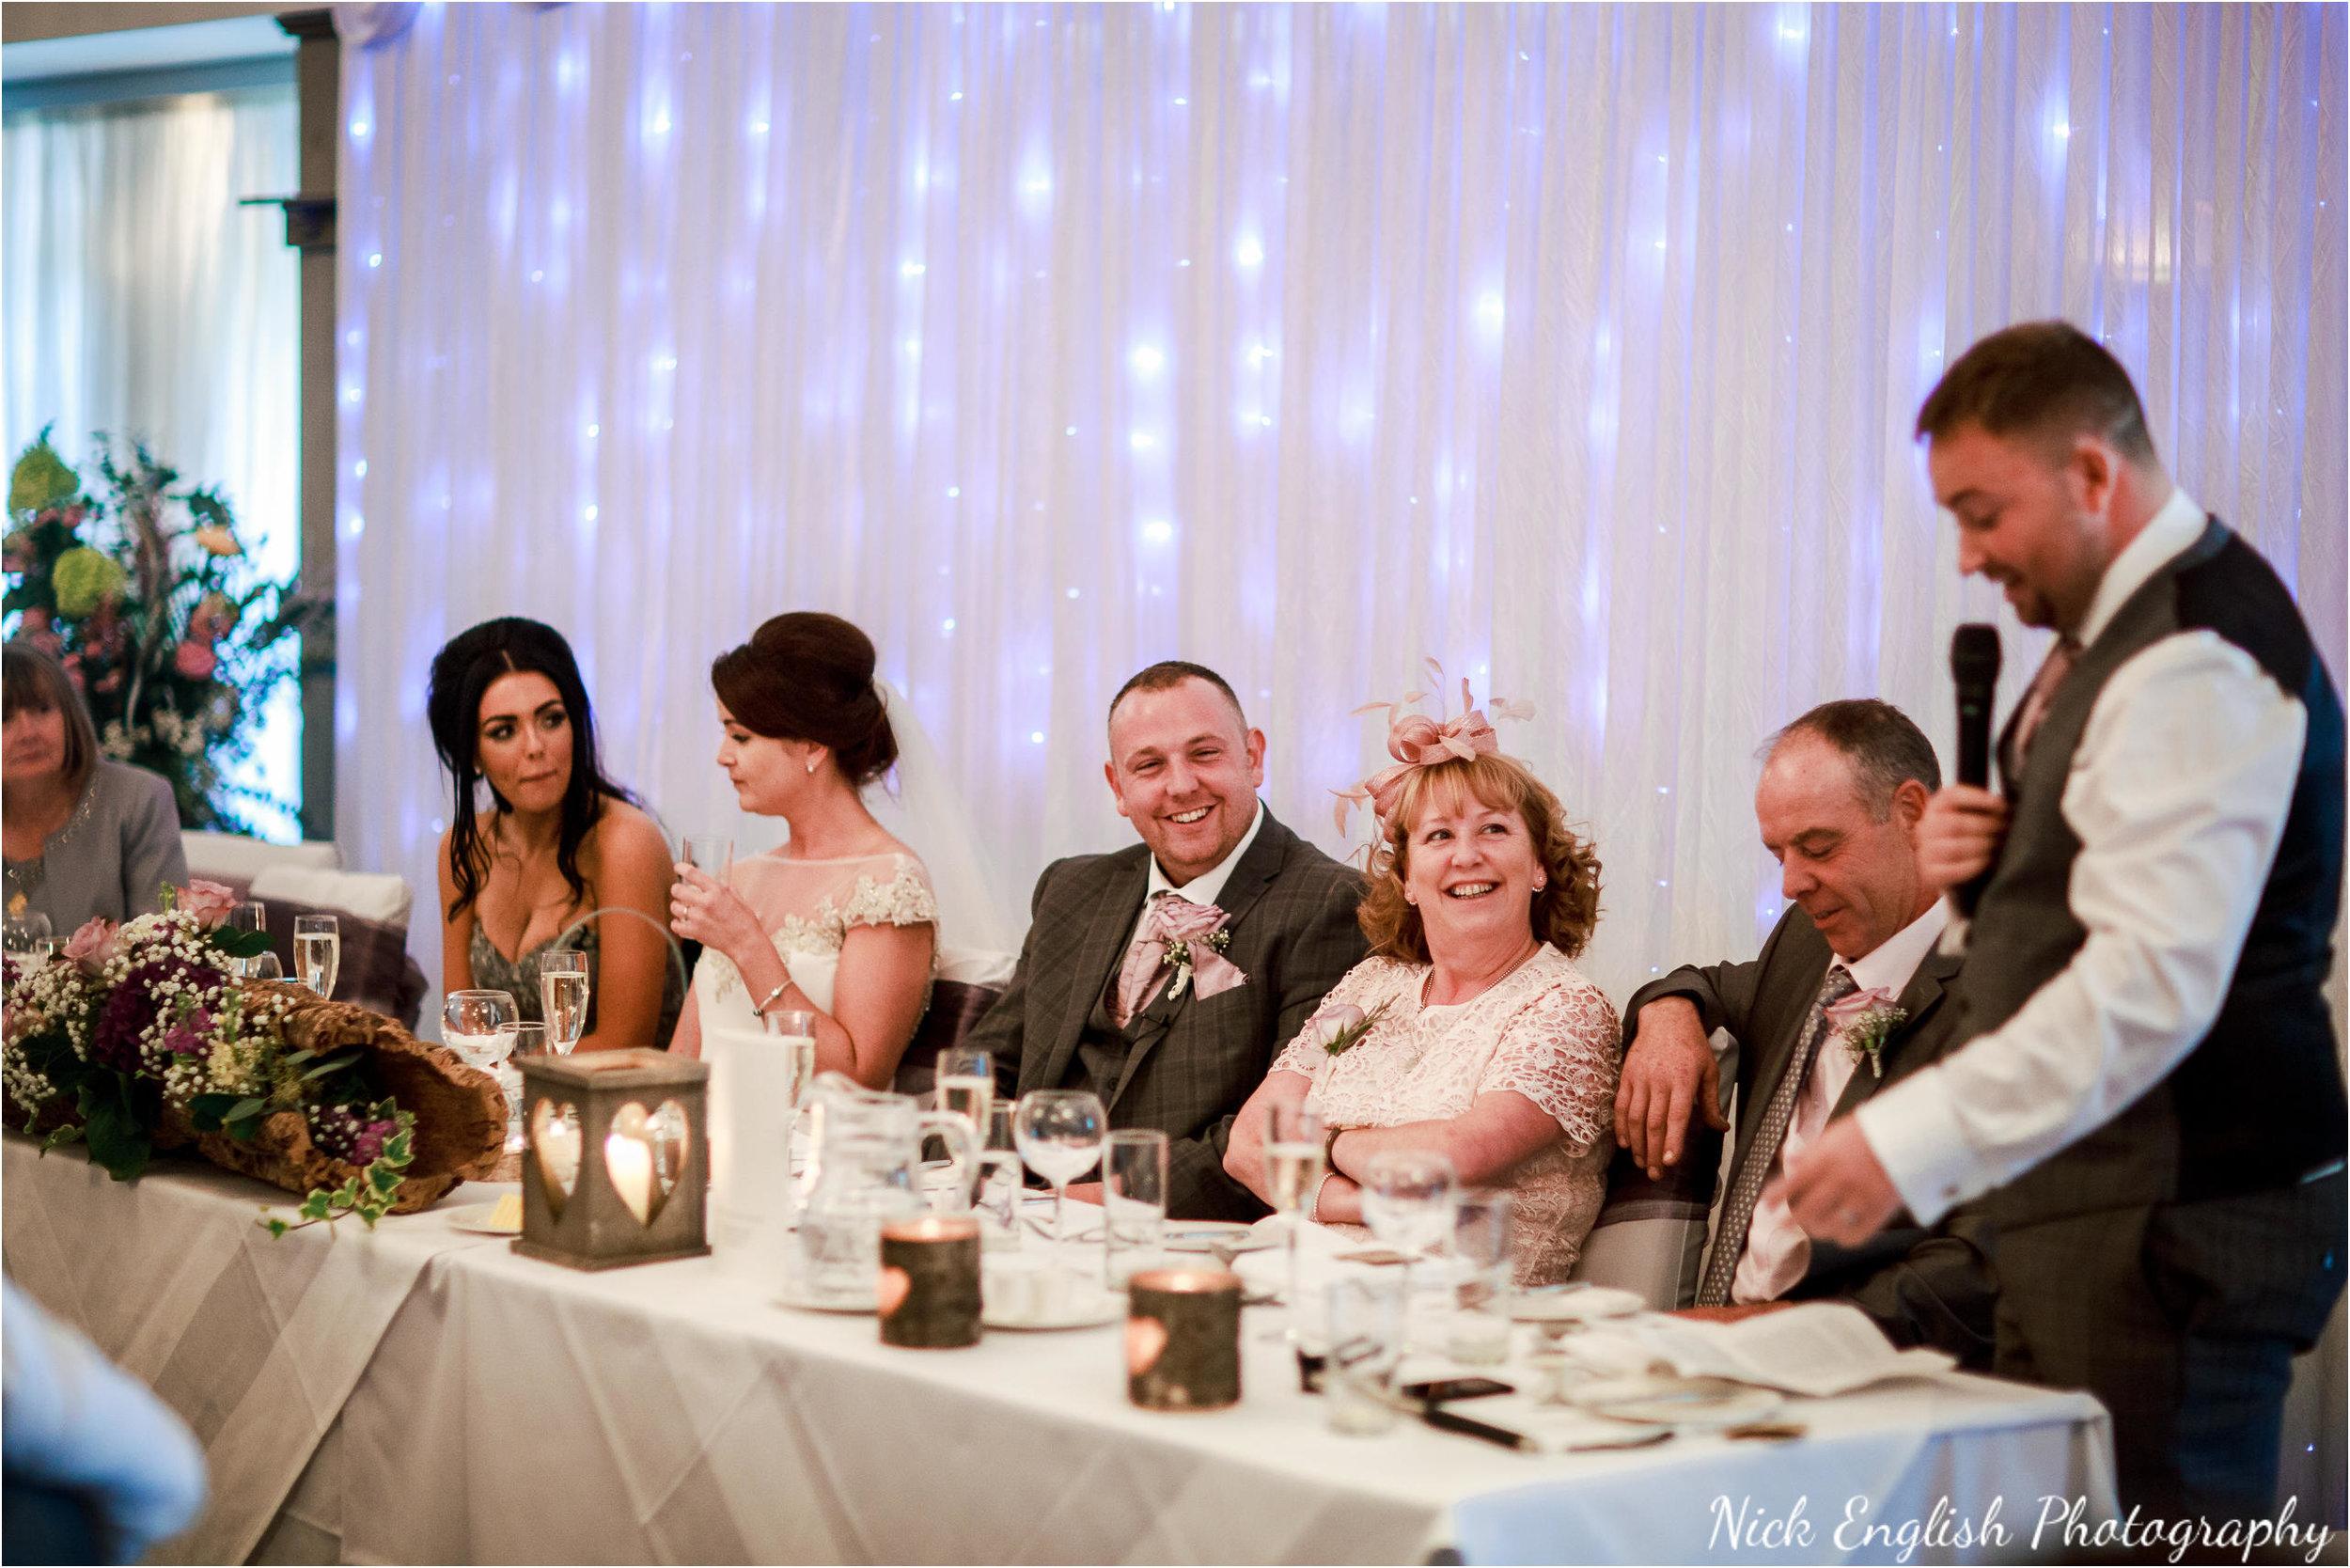 Stacey-Ash-Wedding-Photographs-Stanley-House-Preston-Lancashire-176.jpg